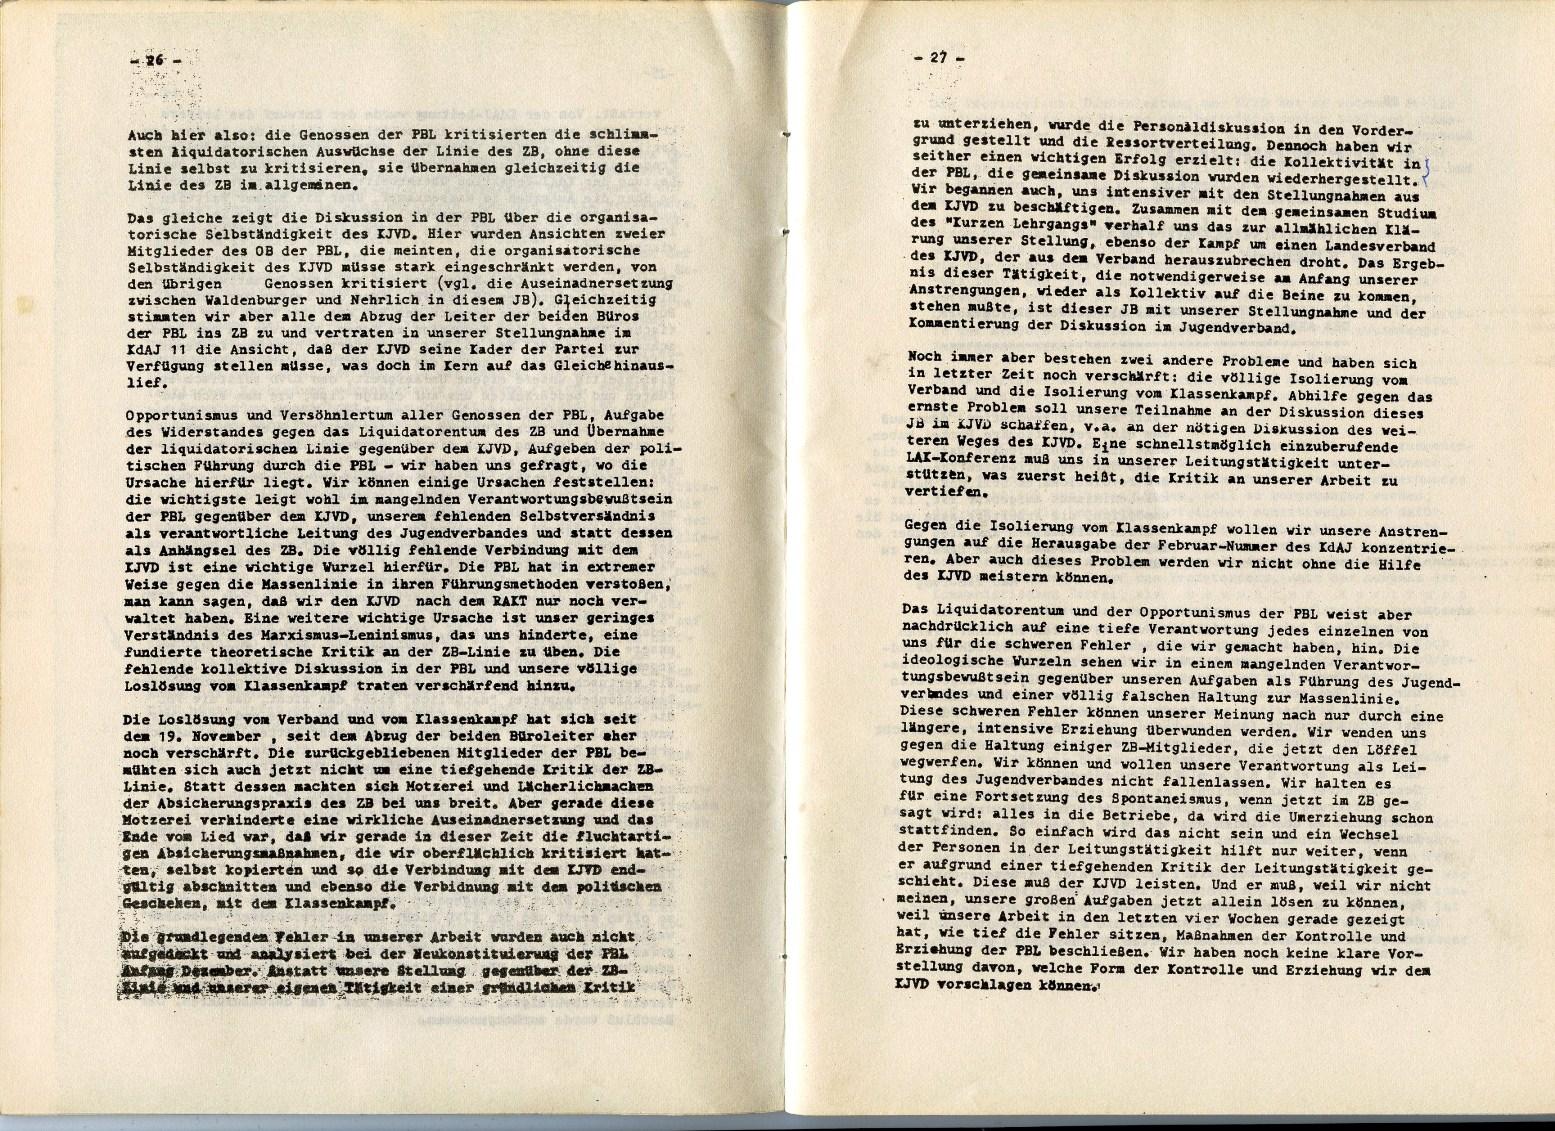 ZB_Universitas_1972_17